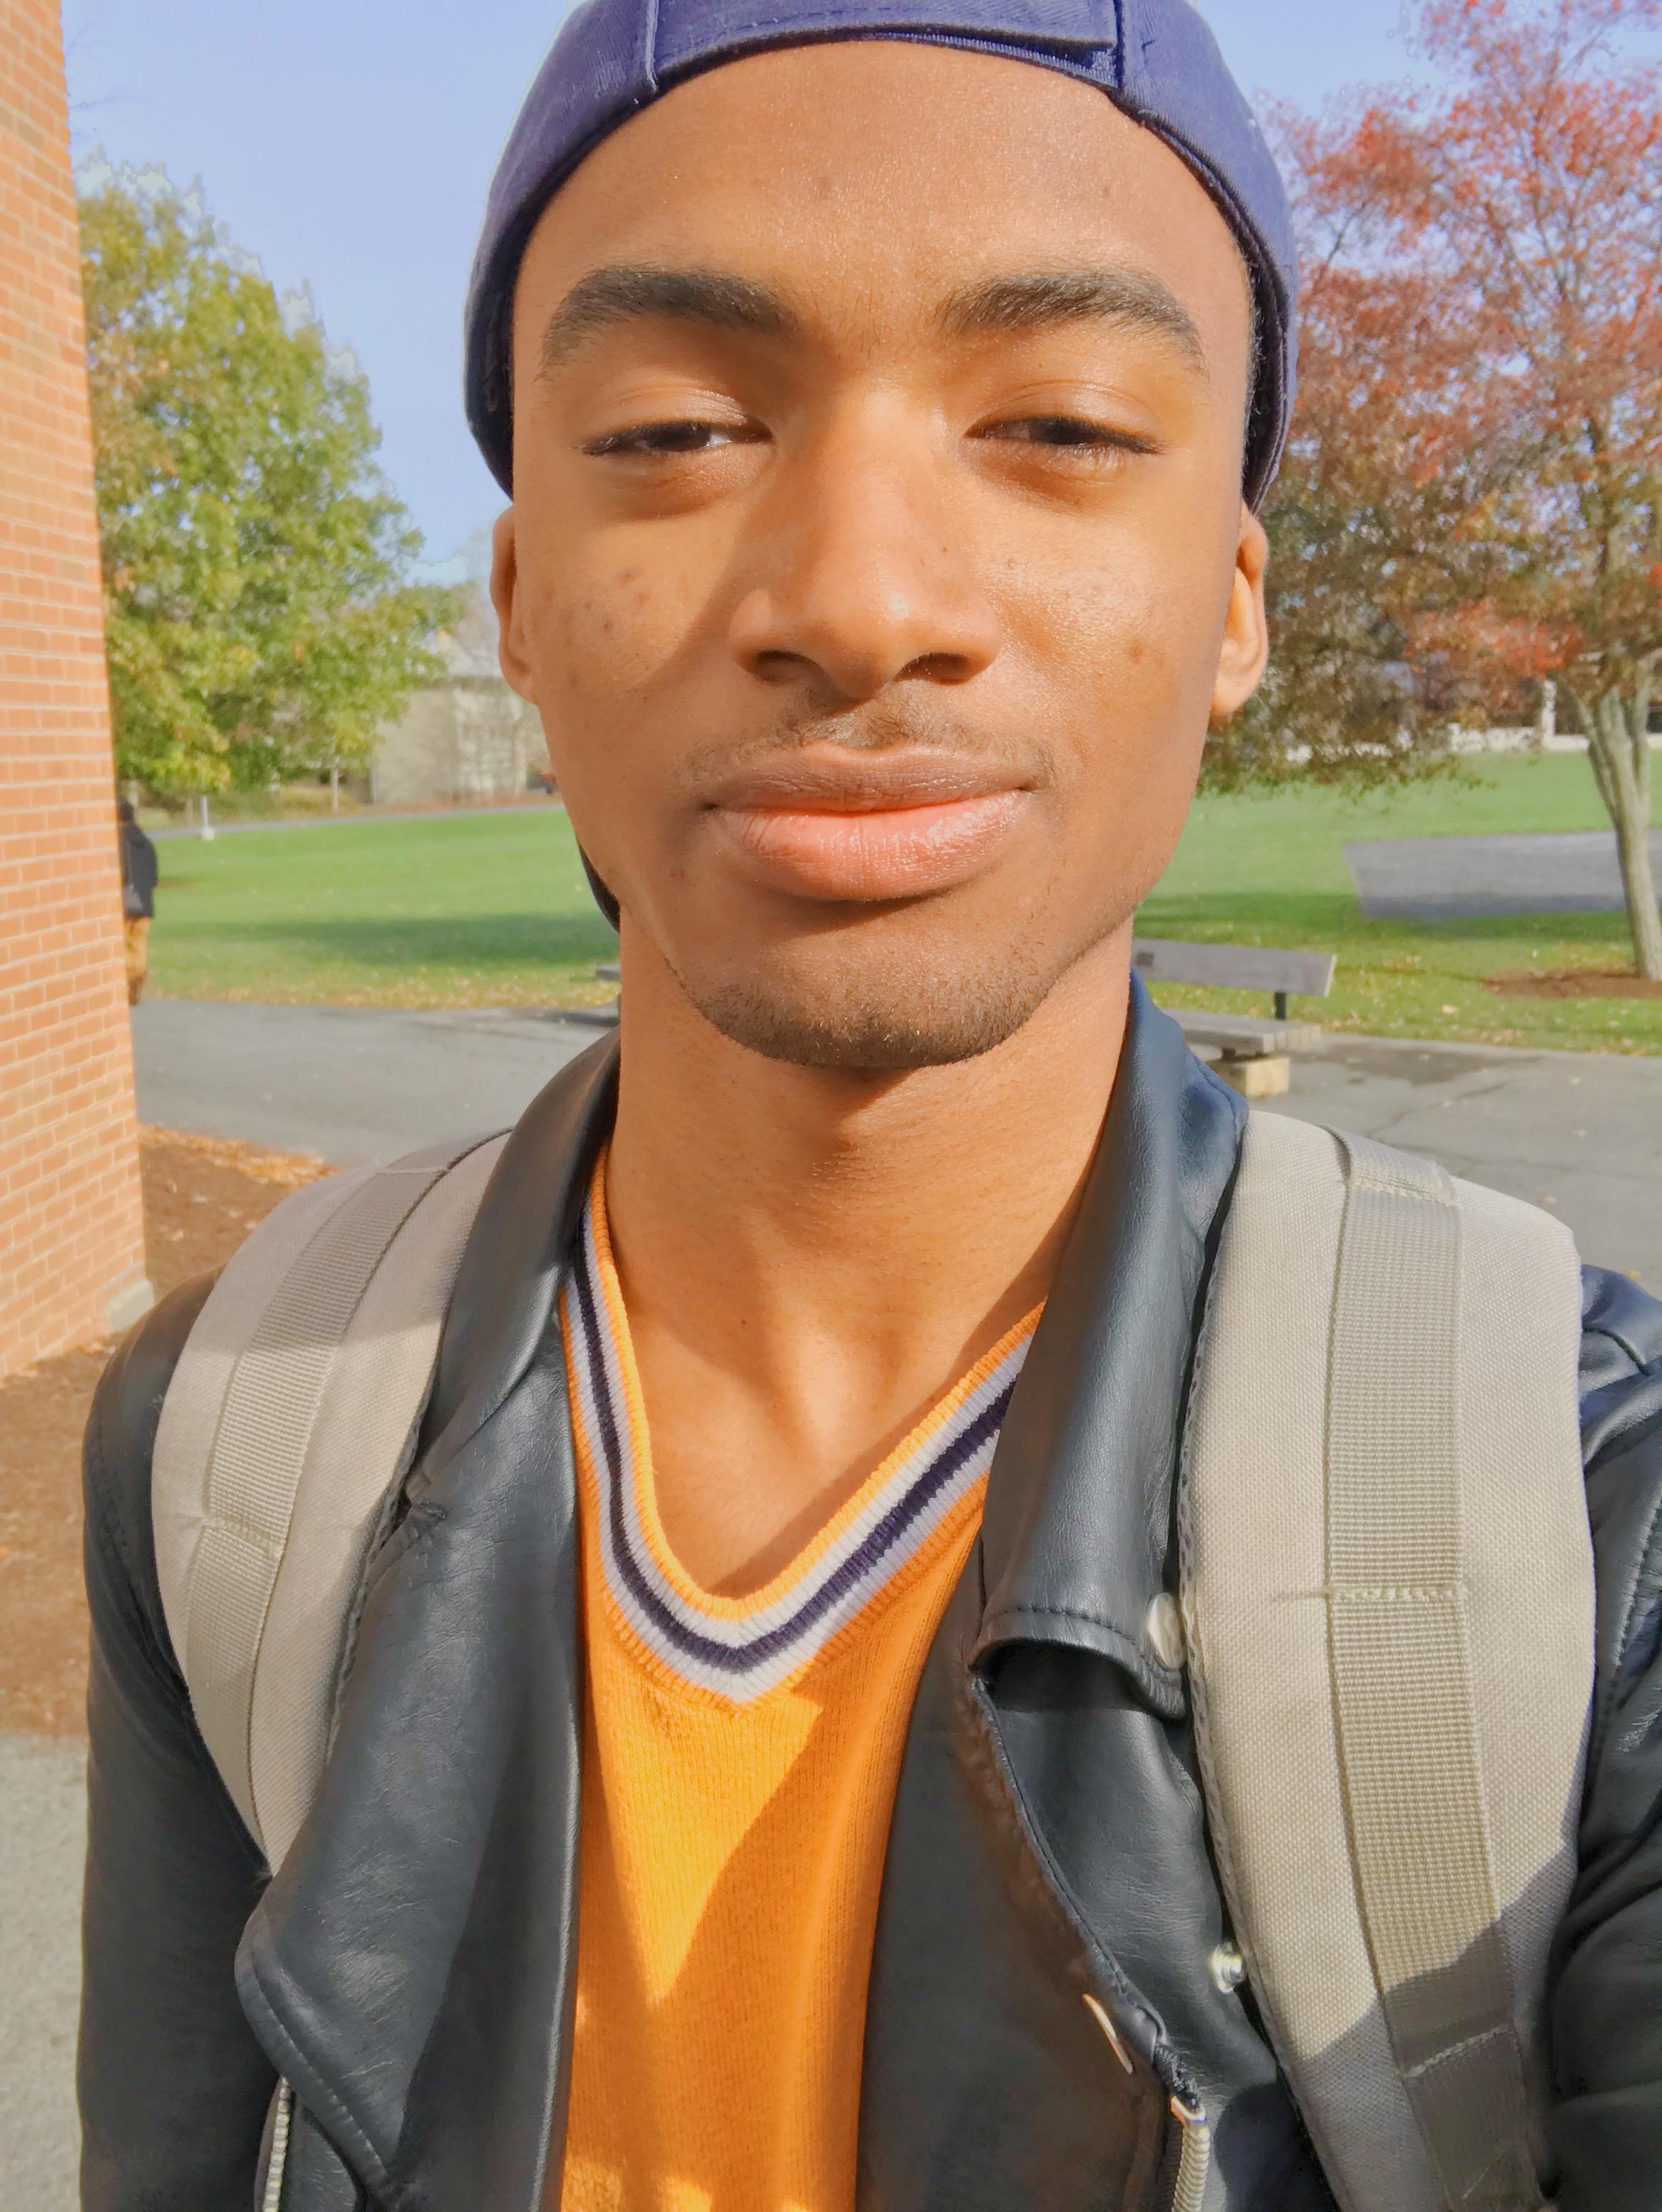 Selfie at Ithaca College